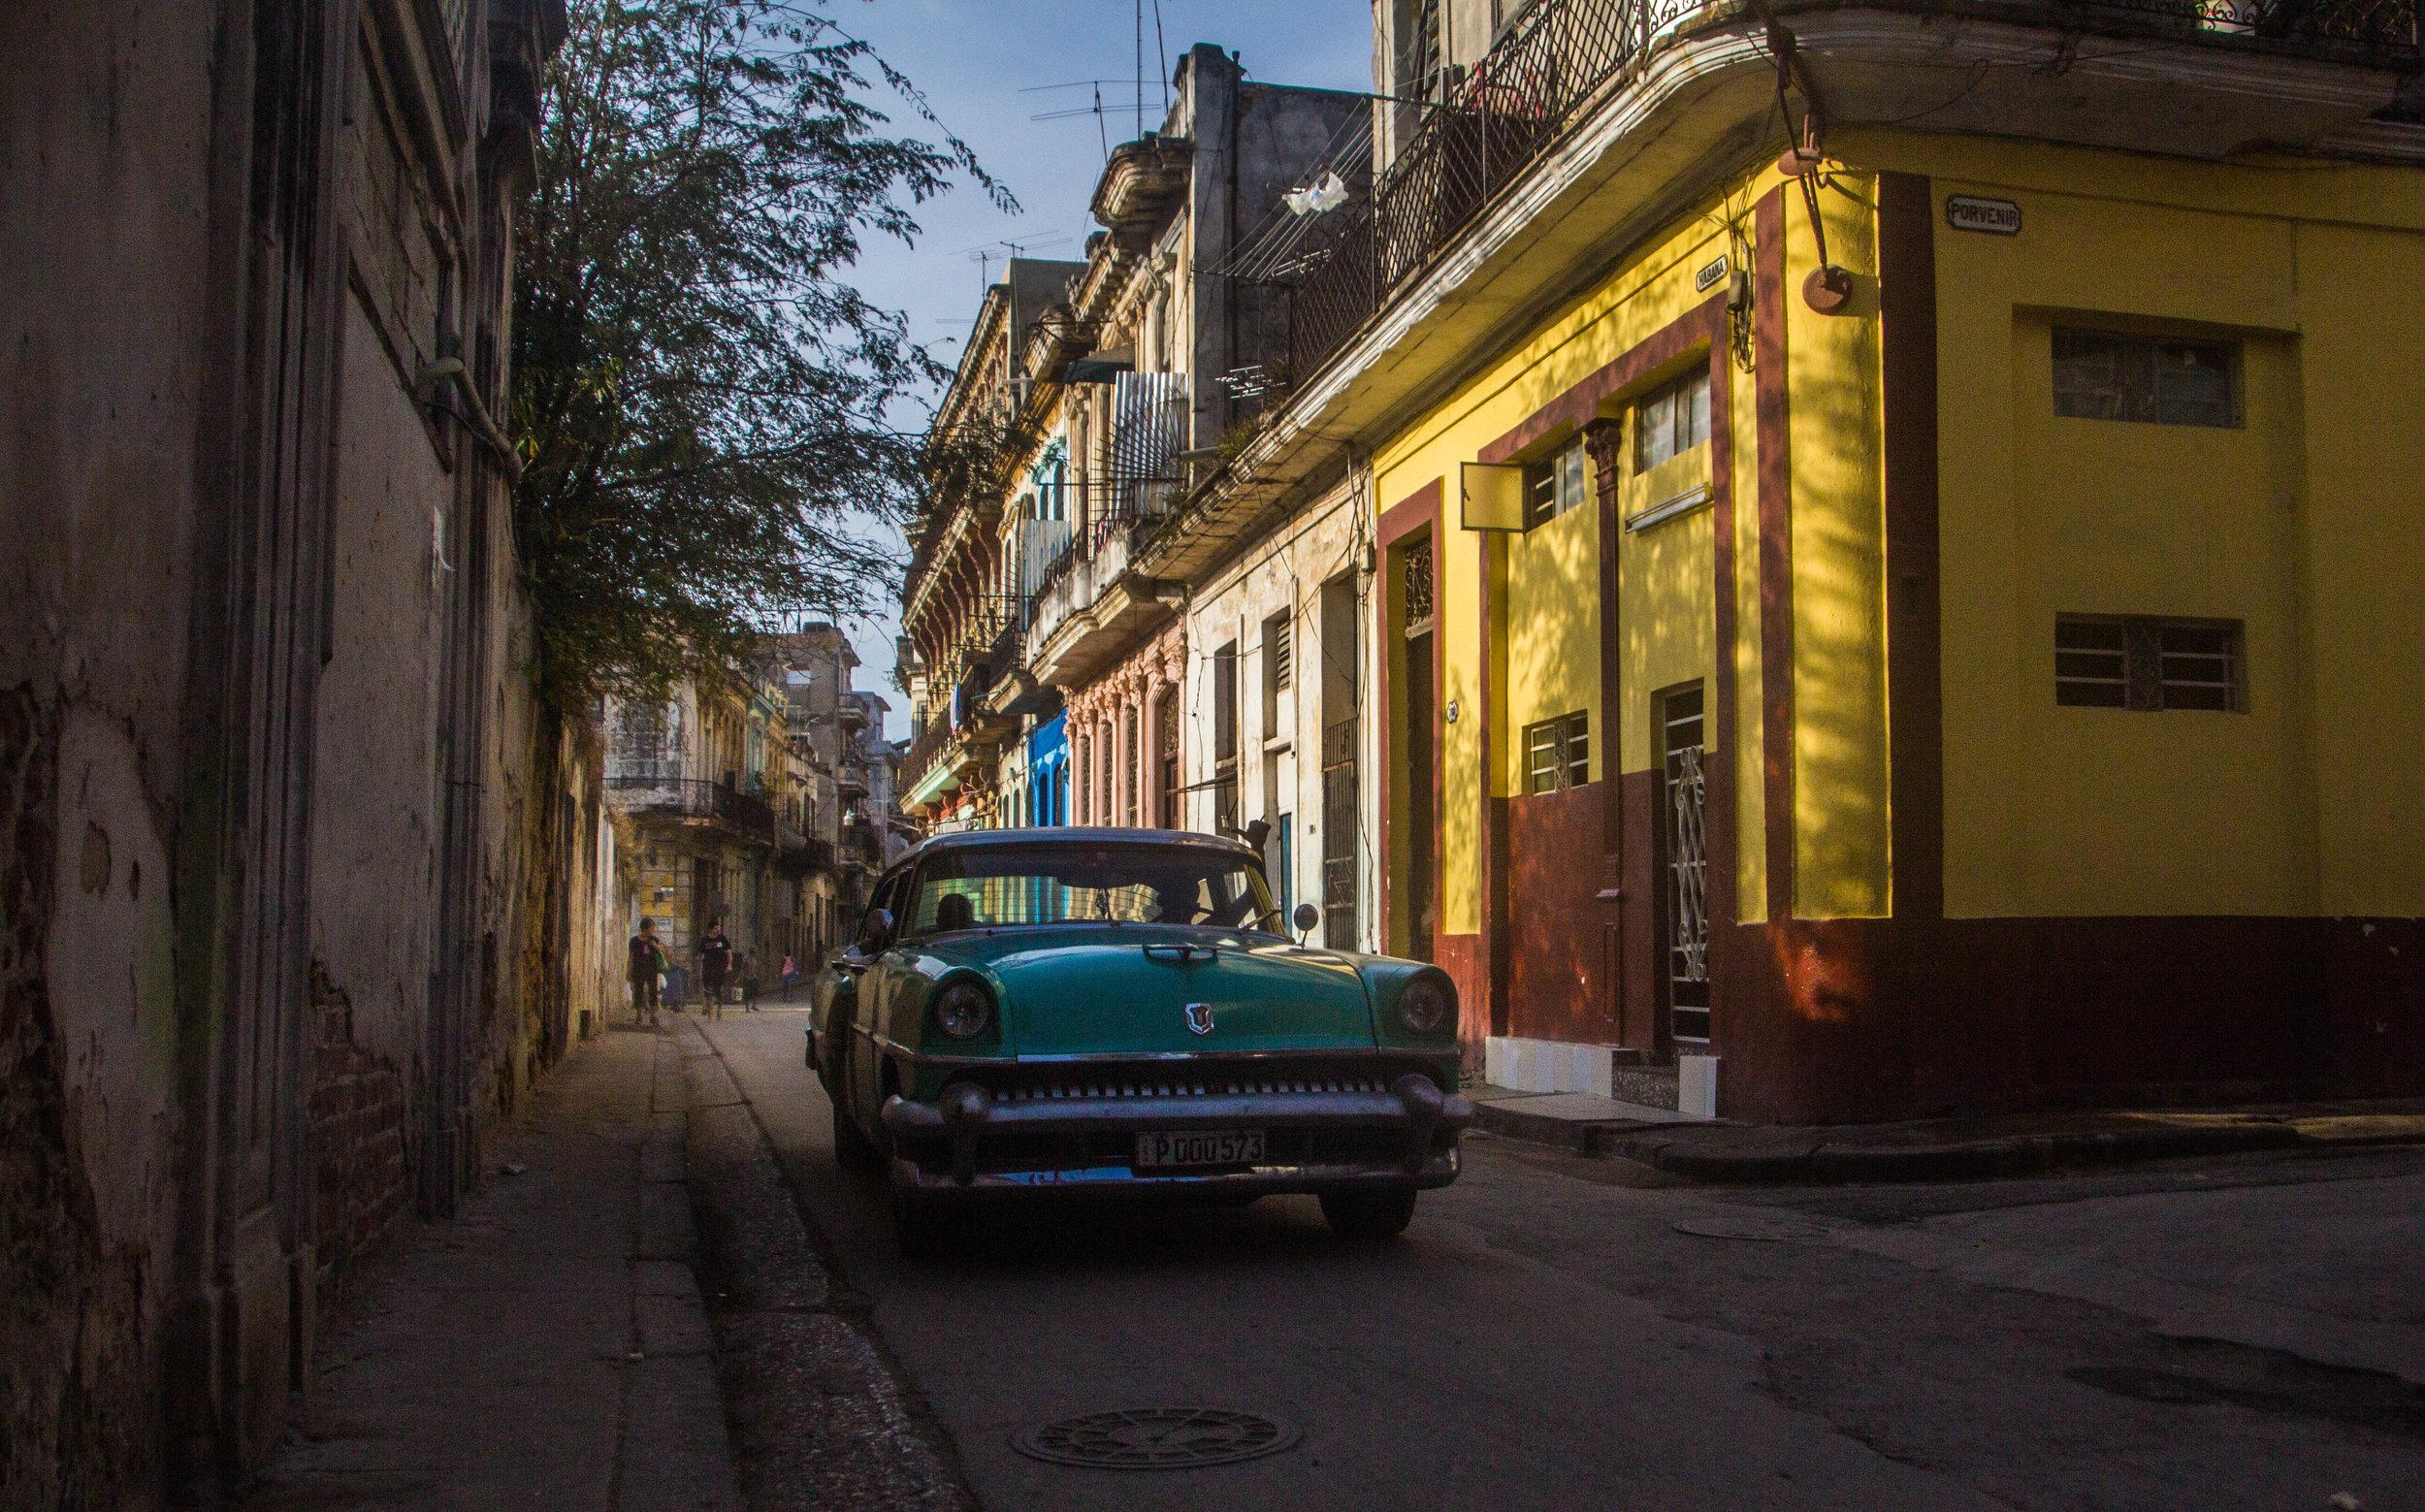 streets old havana cuba-1 copy-2.jpg